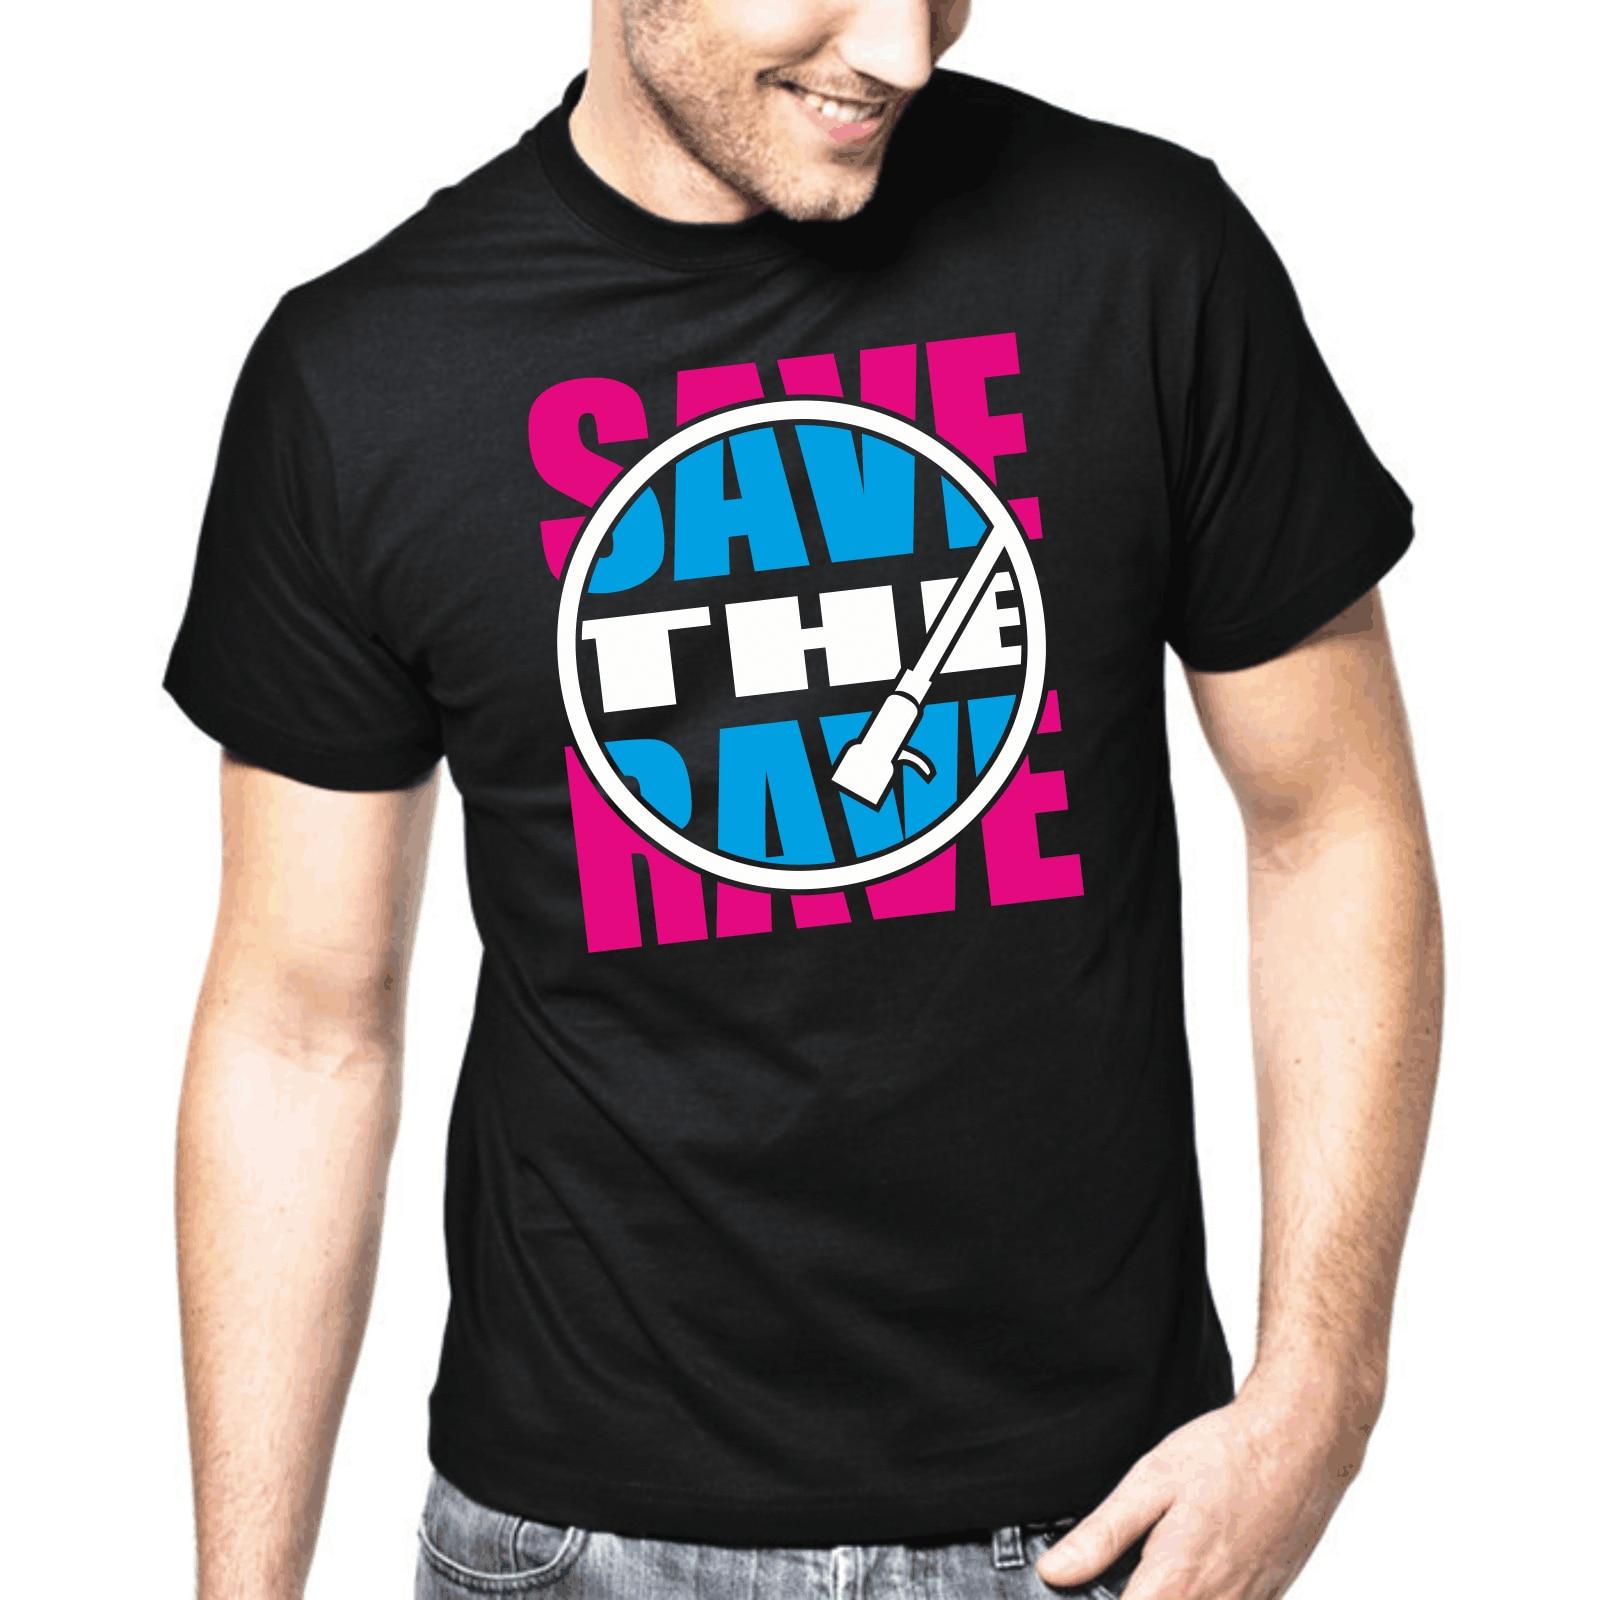 Salvar la fiesta tecno música electrónica Trance Club DE DJ S-3XL Camiseta de algodón diseño 3D T camisa hombres Camiseta de manga corta